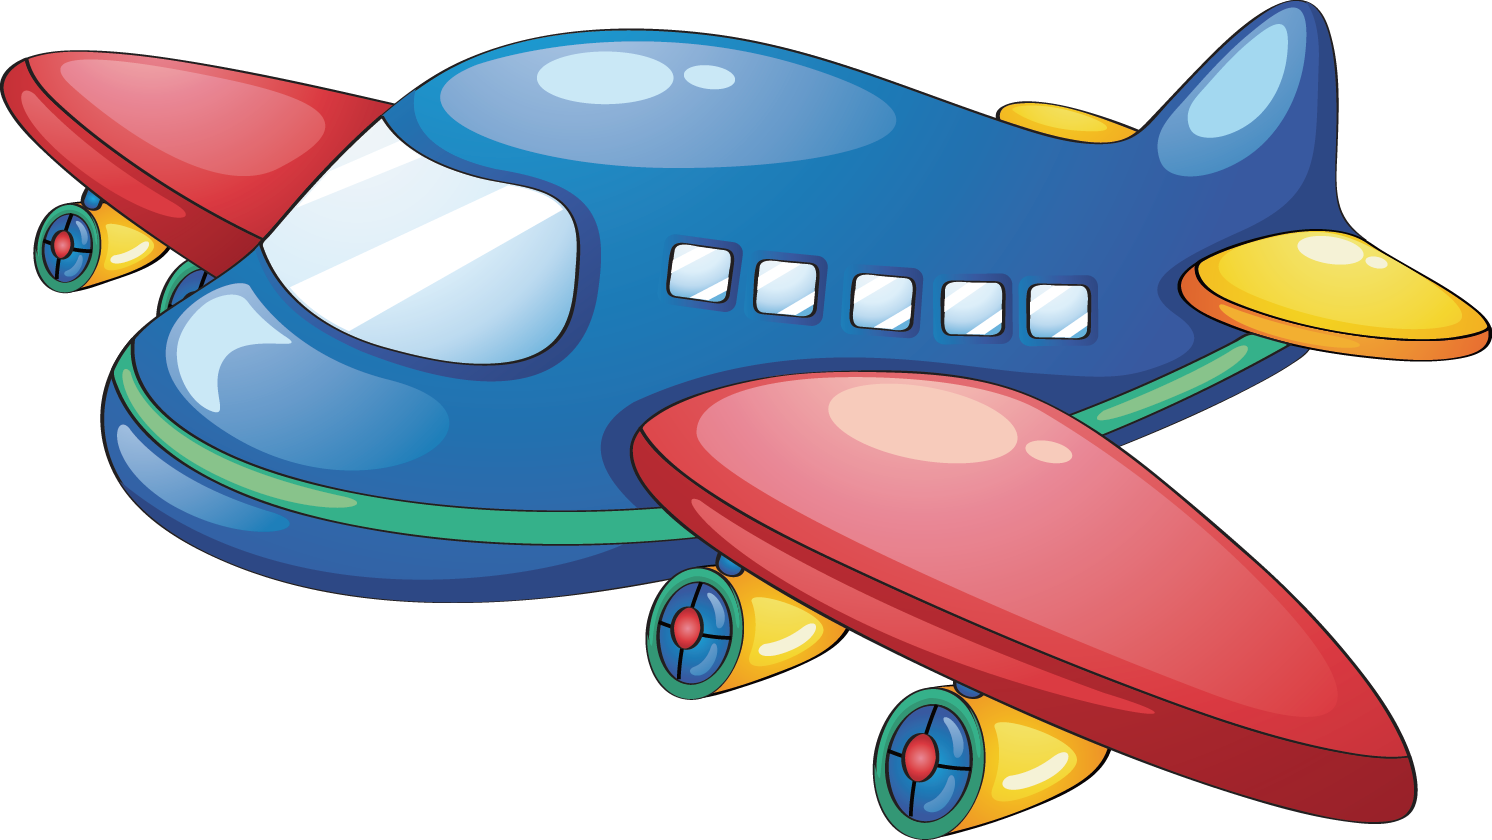 Clipart rocket air transport, Clipart rocket air transport